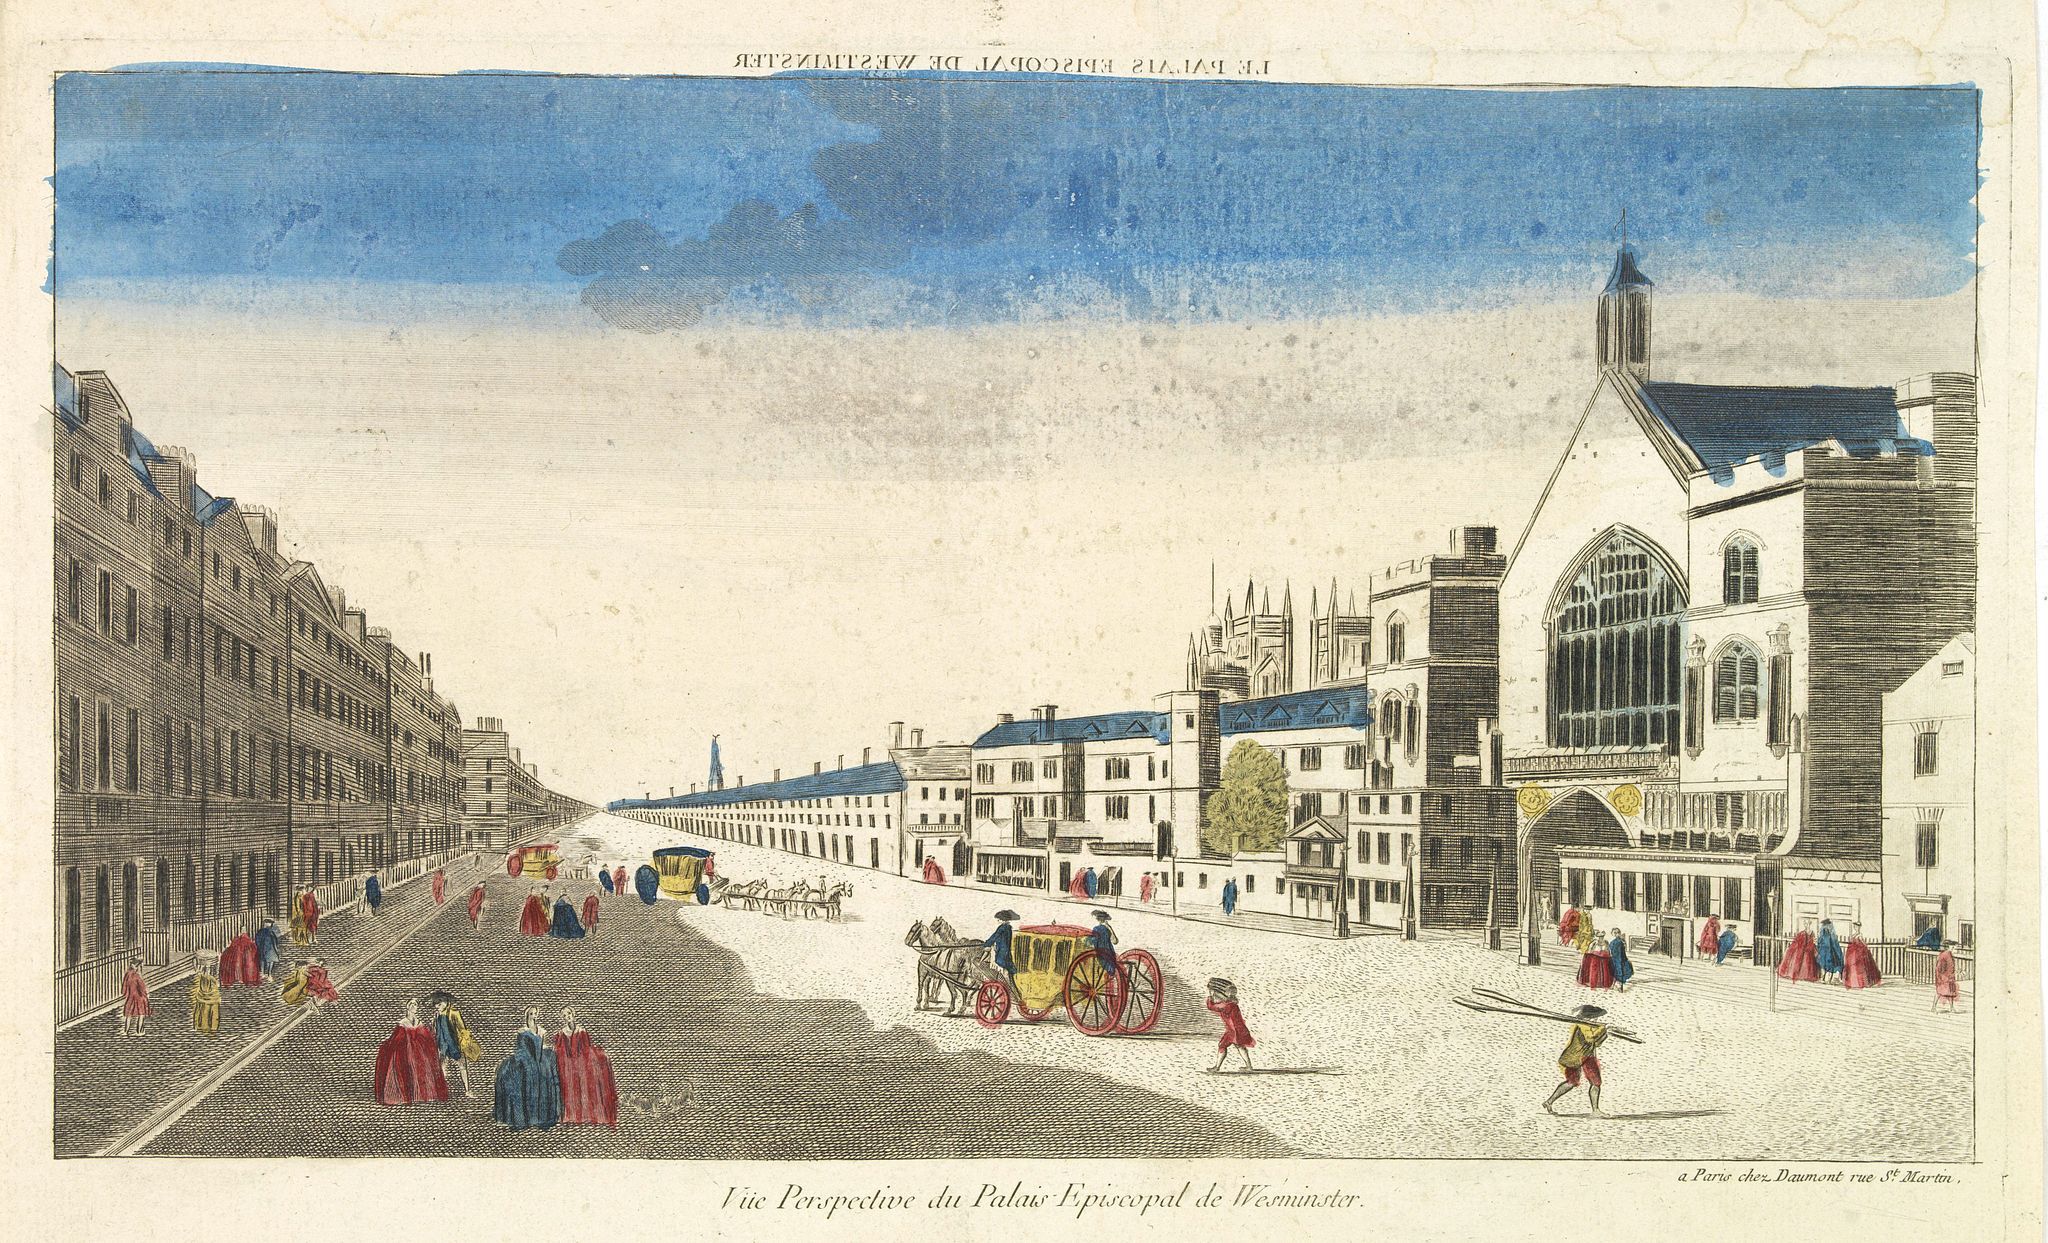 CHEREAU, J. -  Vue perspective du palais episcopal de Westminster.